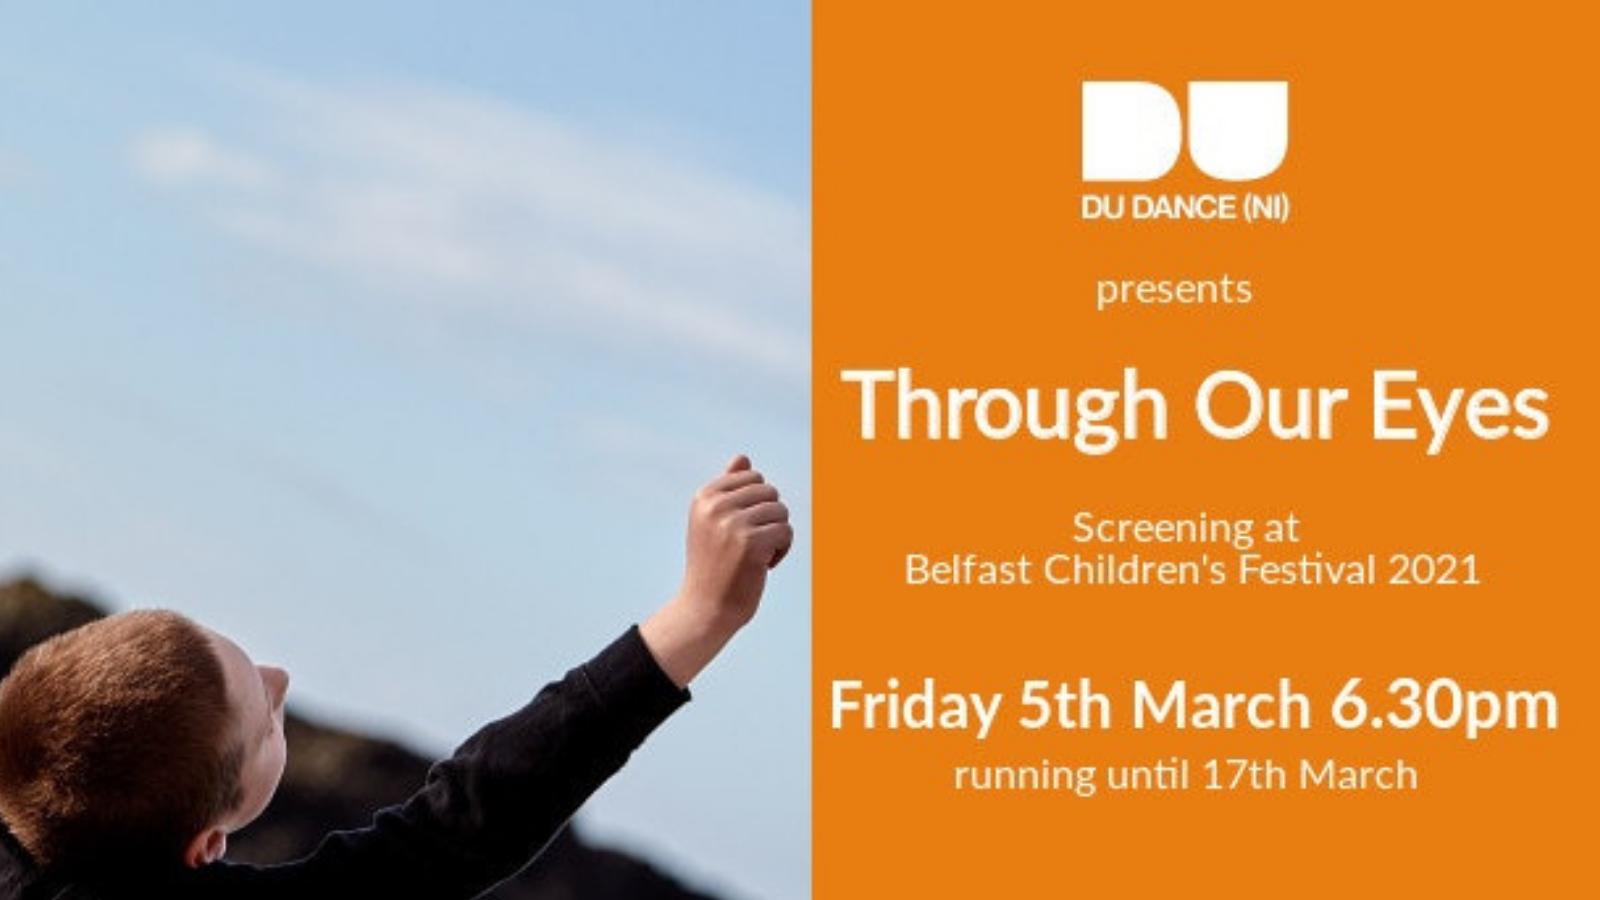 DU Dance (NI) Presents Through Our Eyes